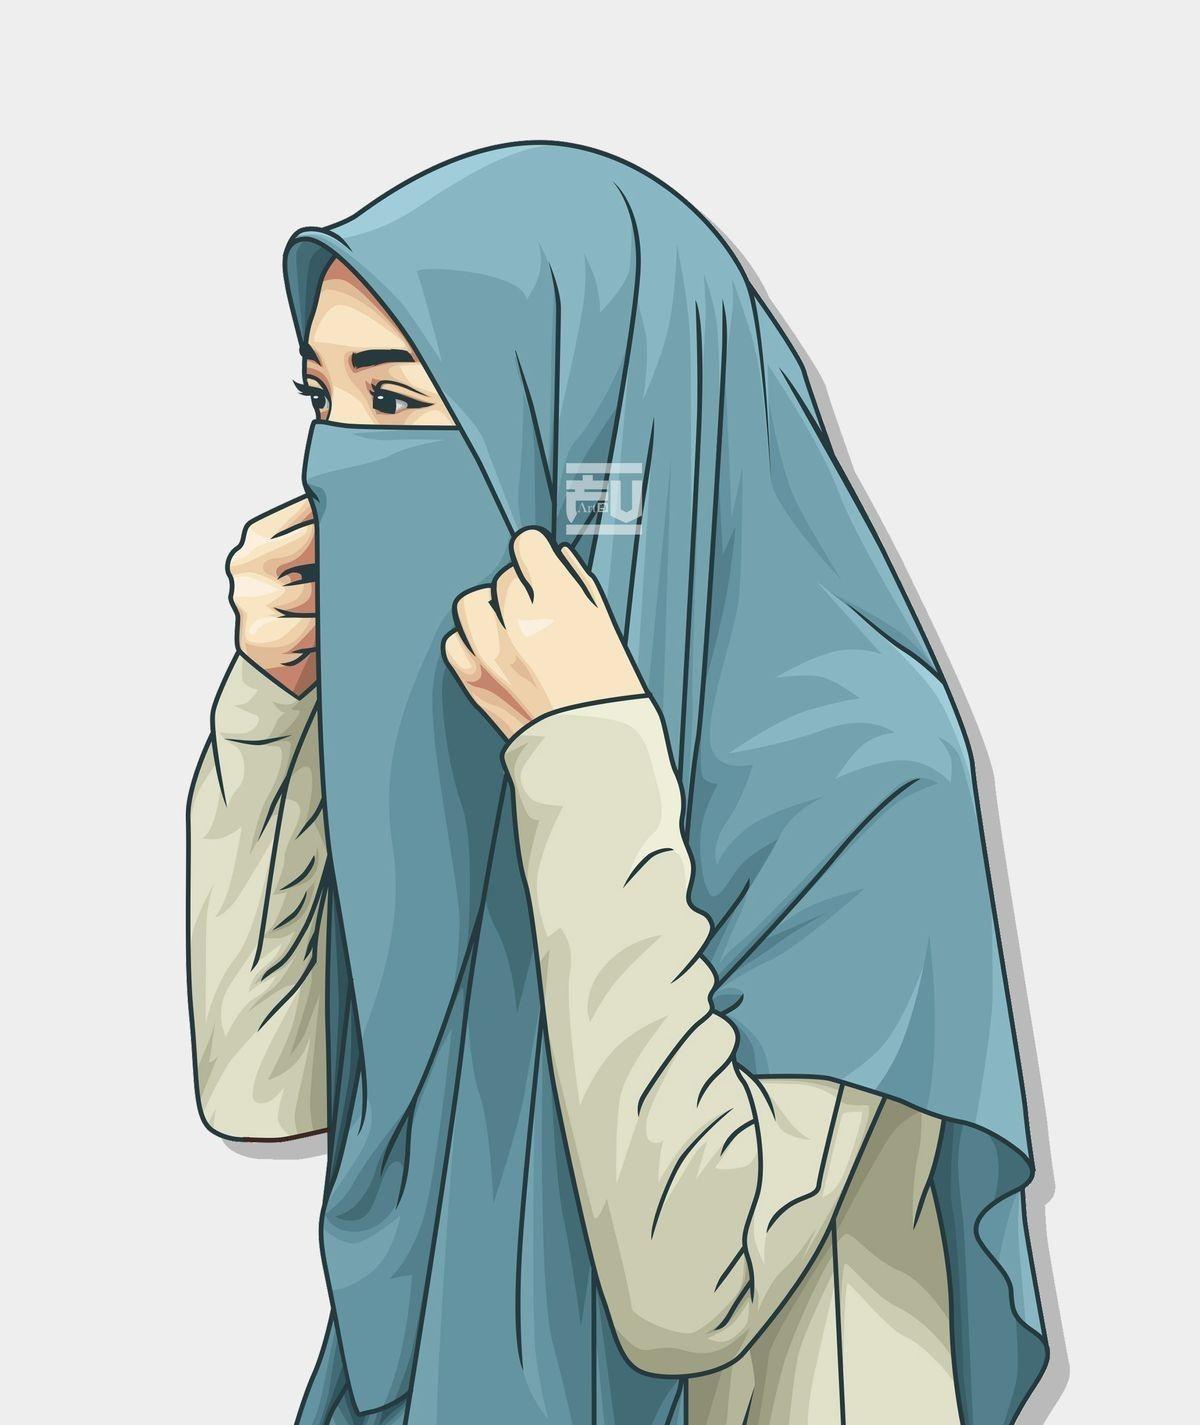 Unduh 850 Gambar Animasi Hijab Hd Paling Keren Hijab Cartoon Hijab Drawing Anime Muslimah